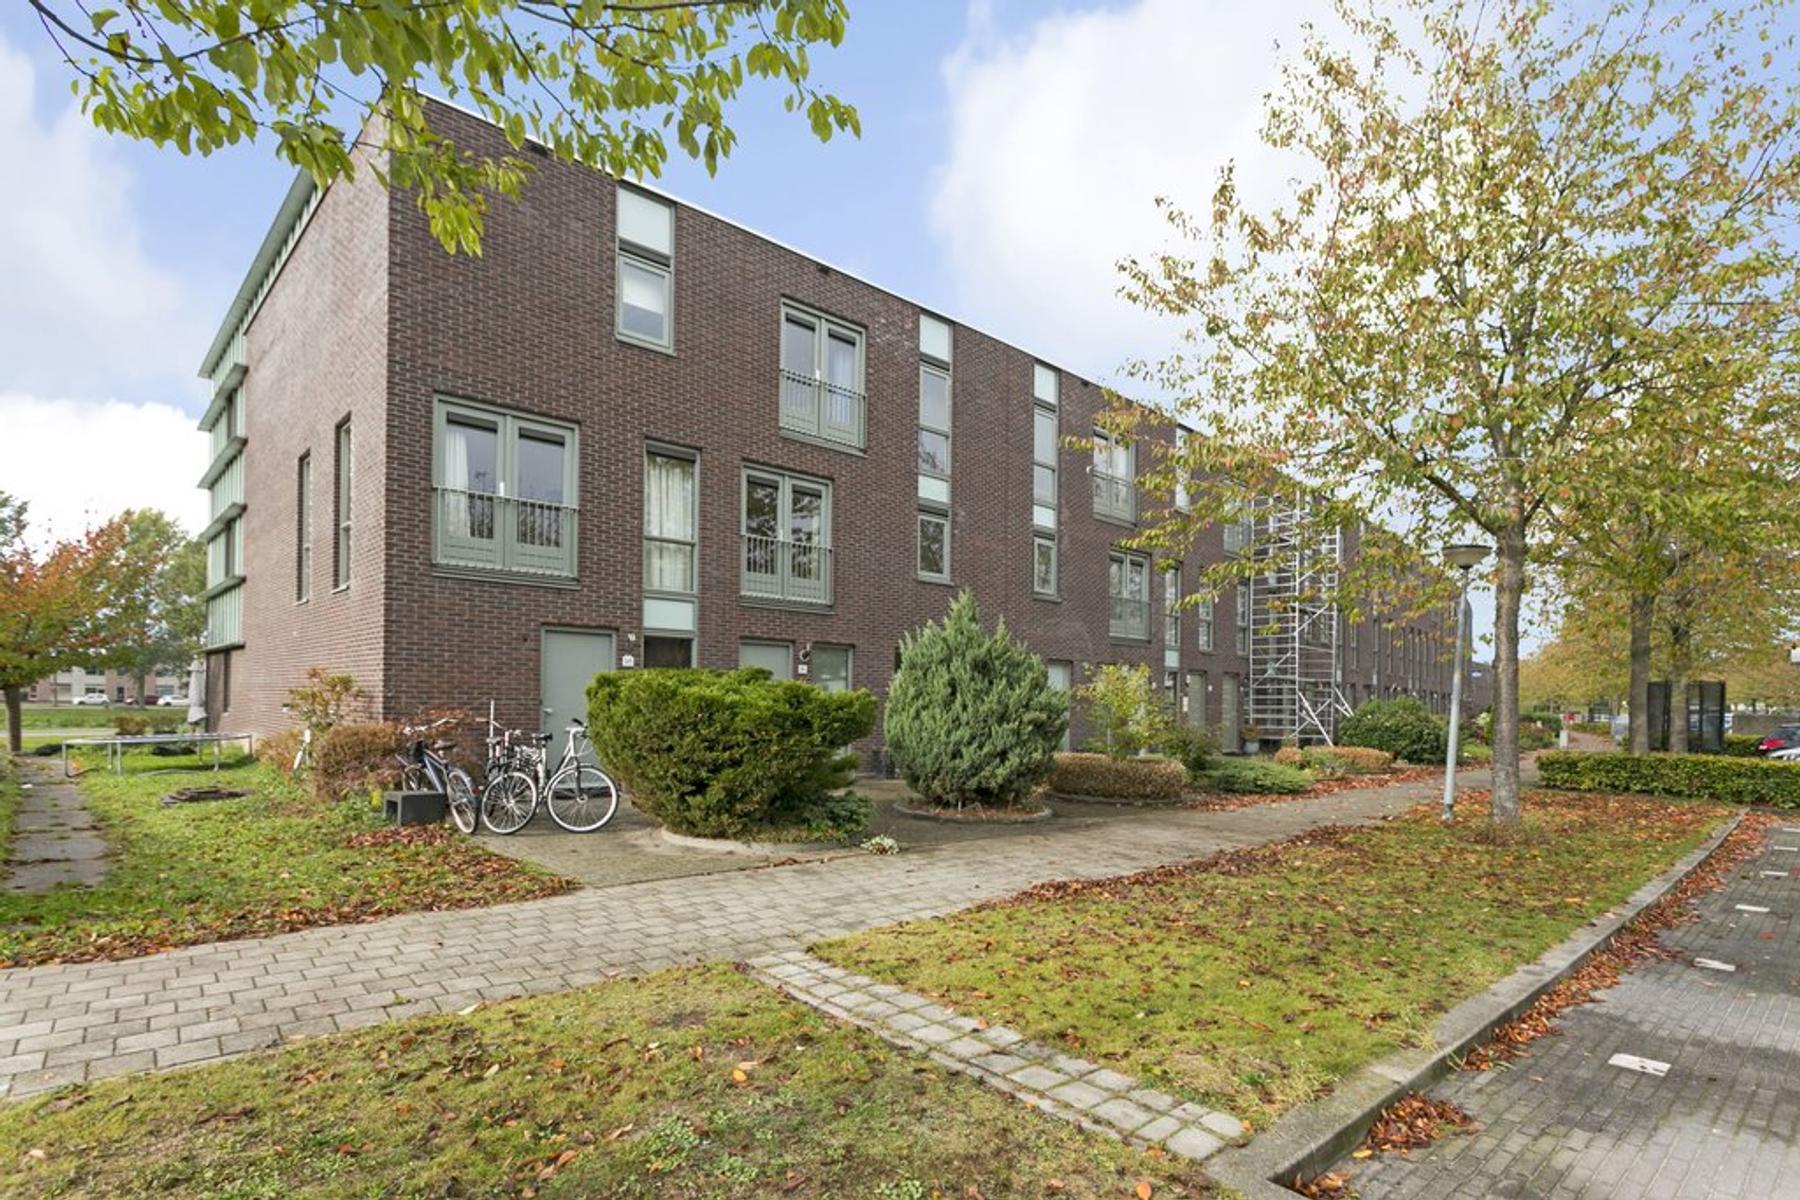 Renoirstraat 96 in Almere 1328 PR